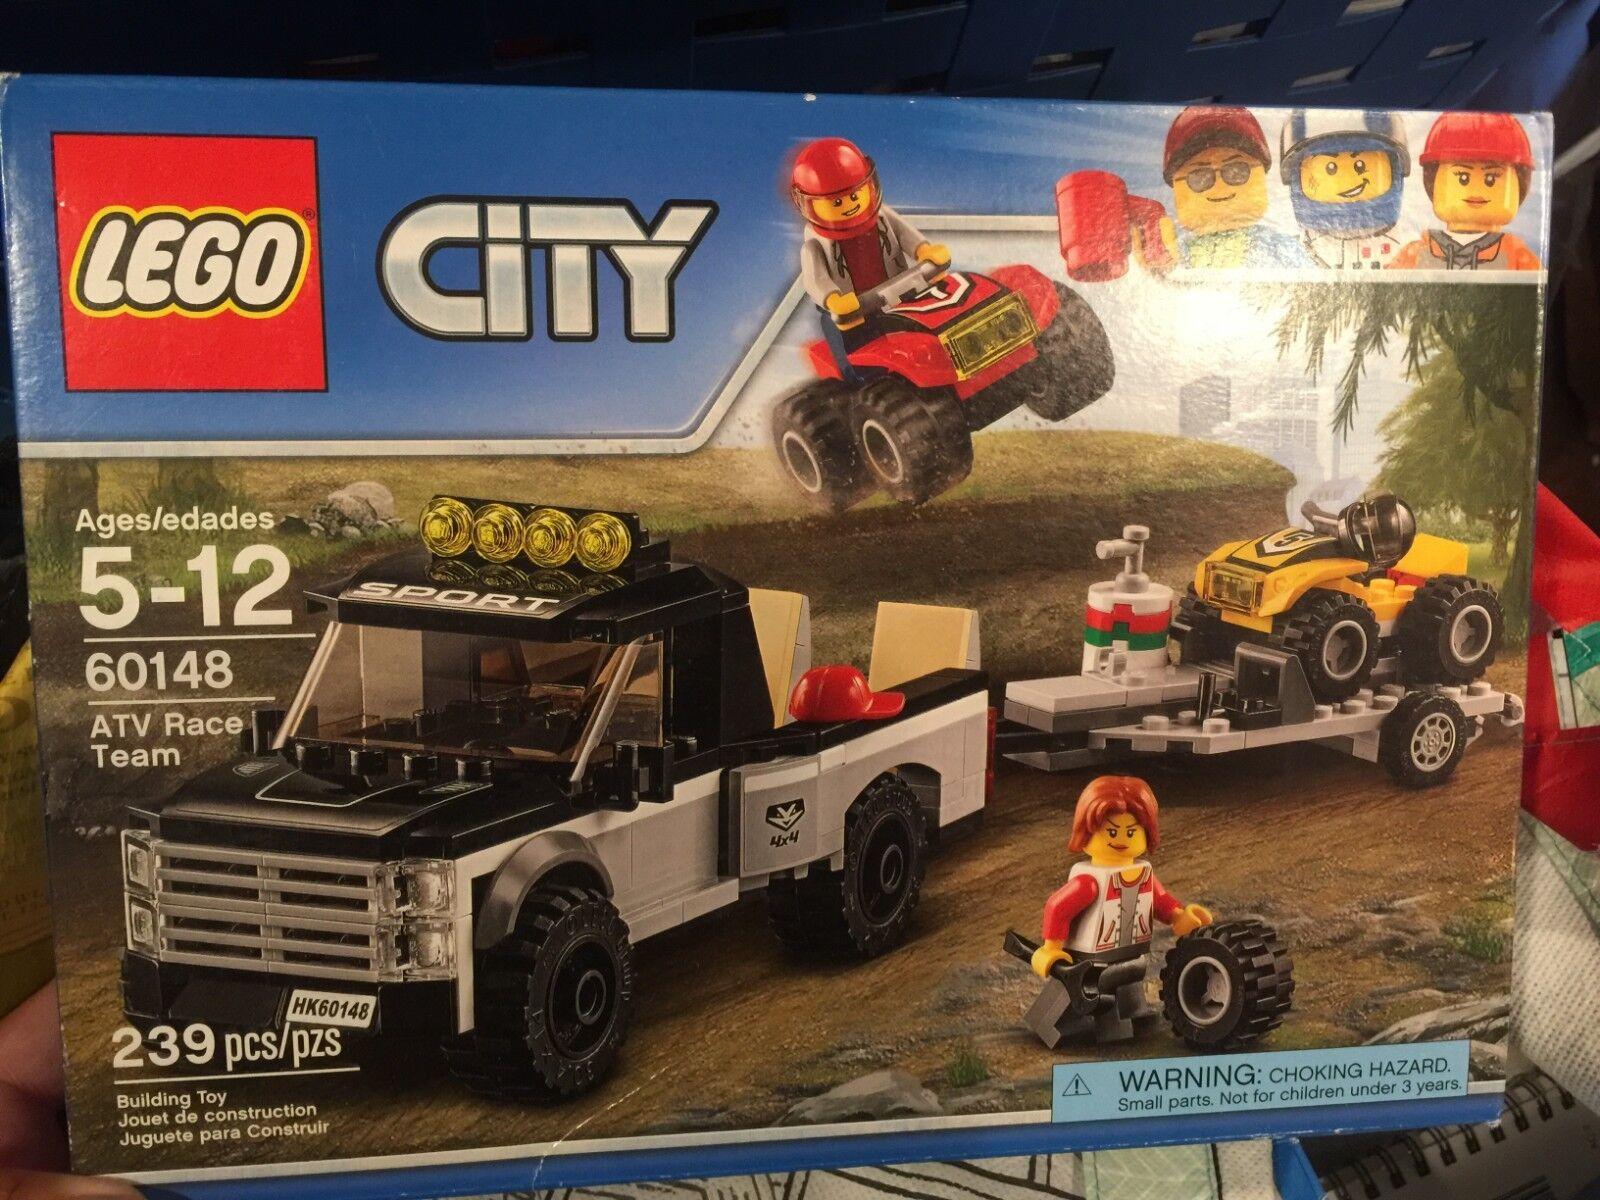 NEW Lego Lego Lego City ATV Race Team 60148 Building Kit Toy 239 Pieces Ages 5-12 752760